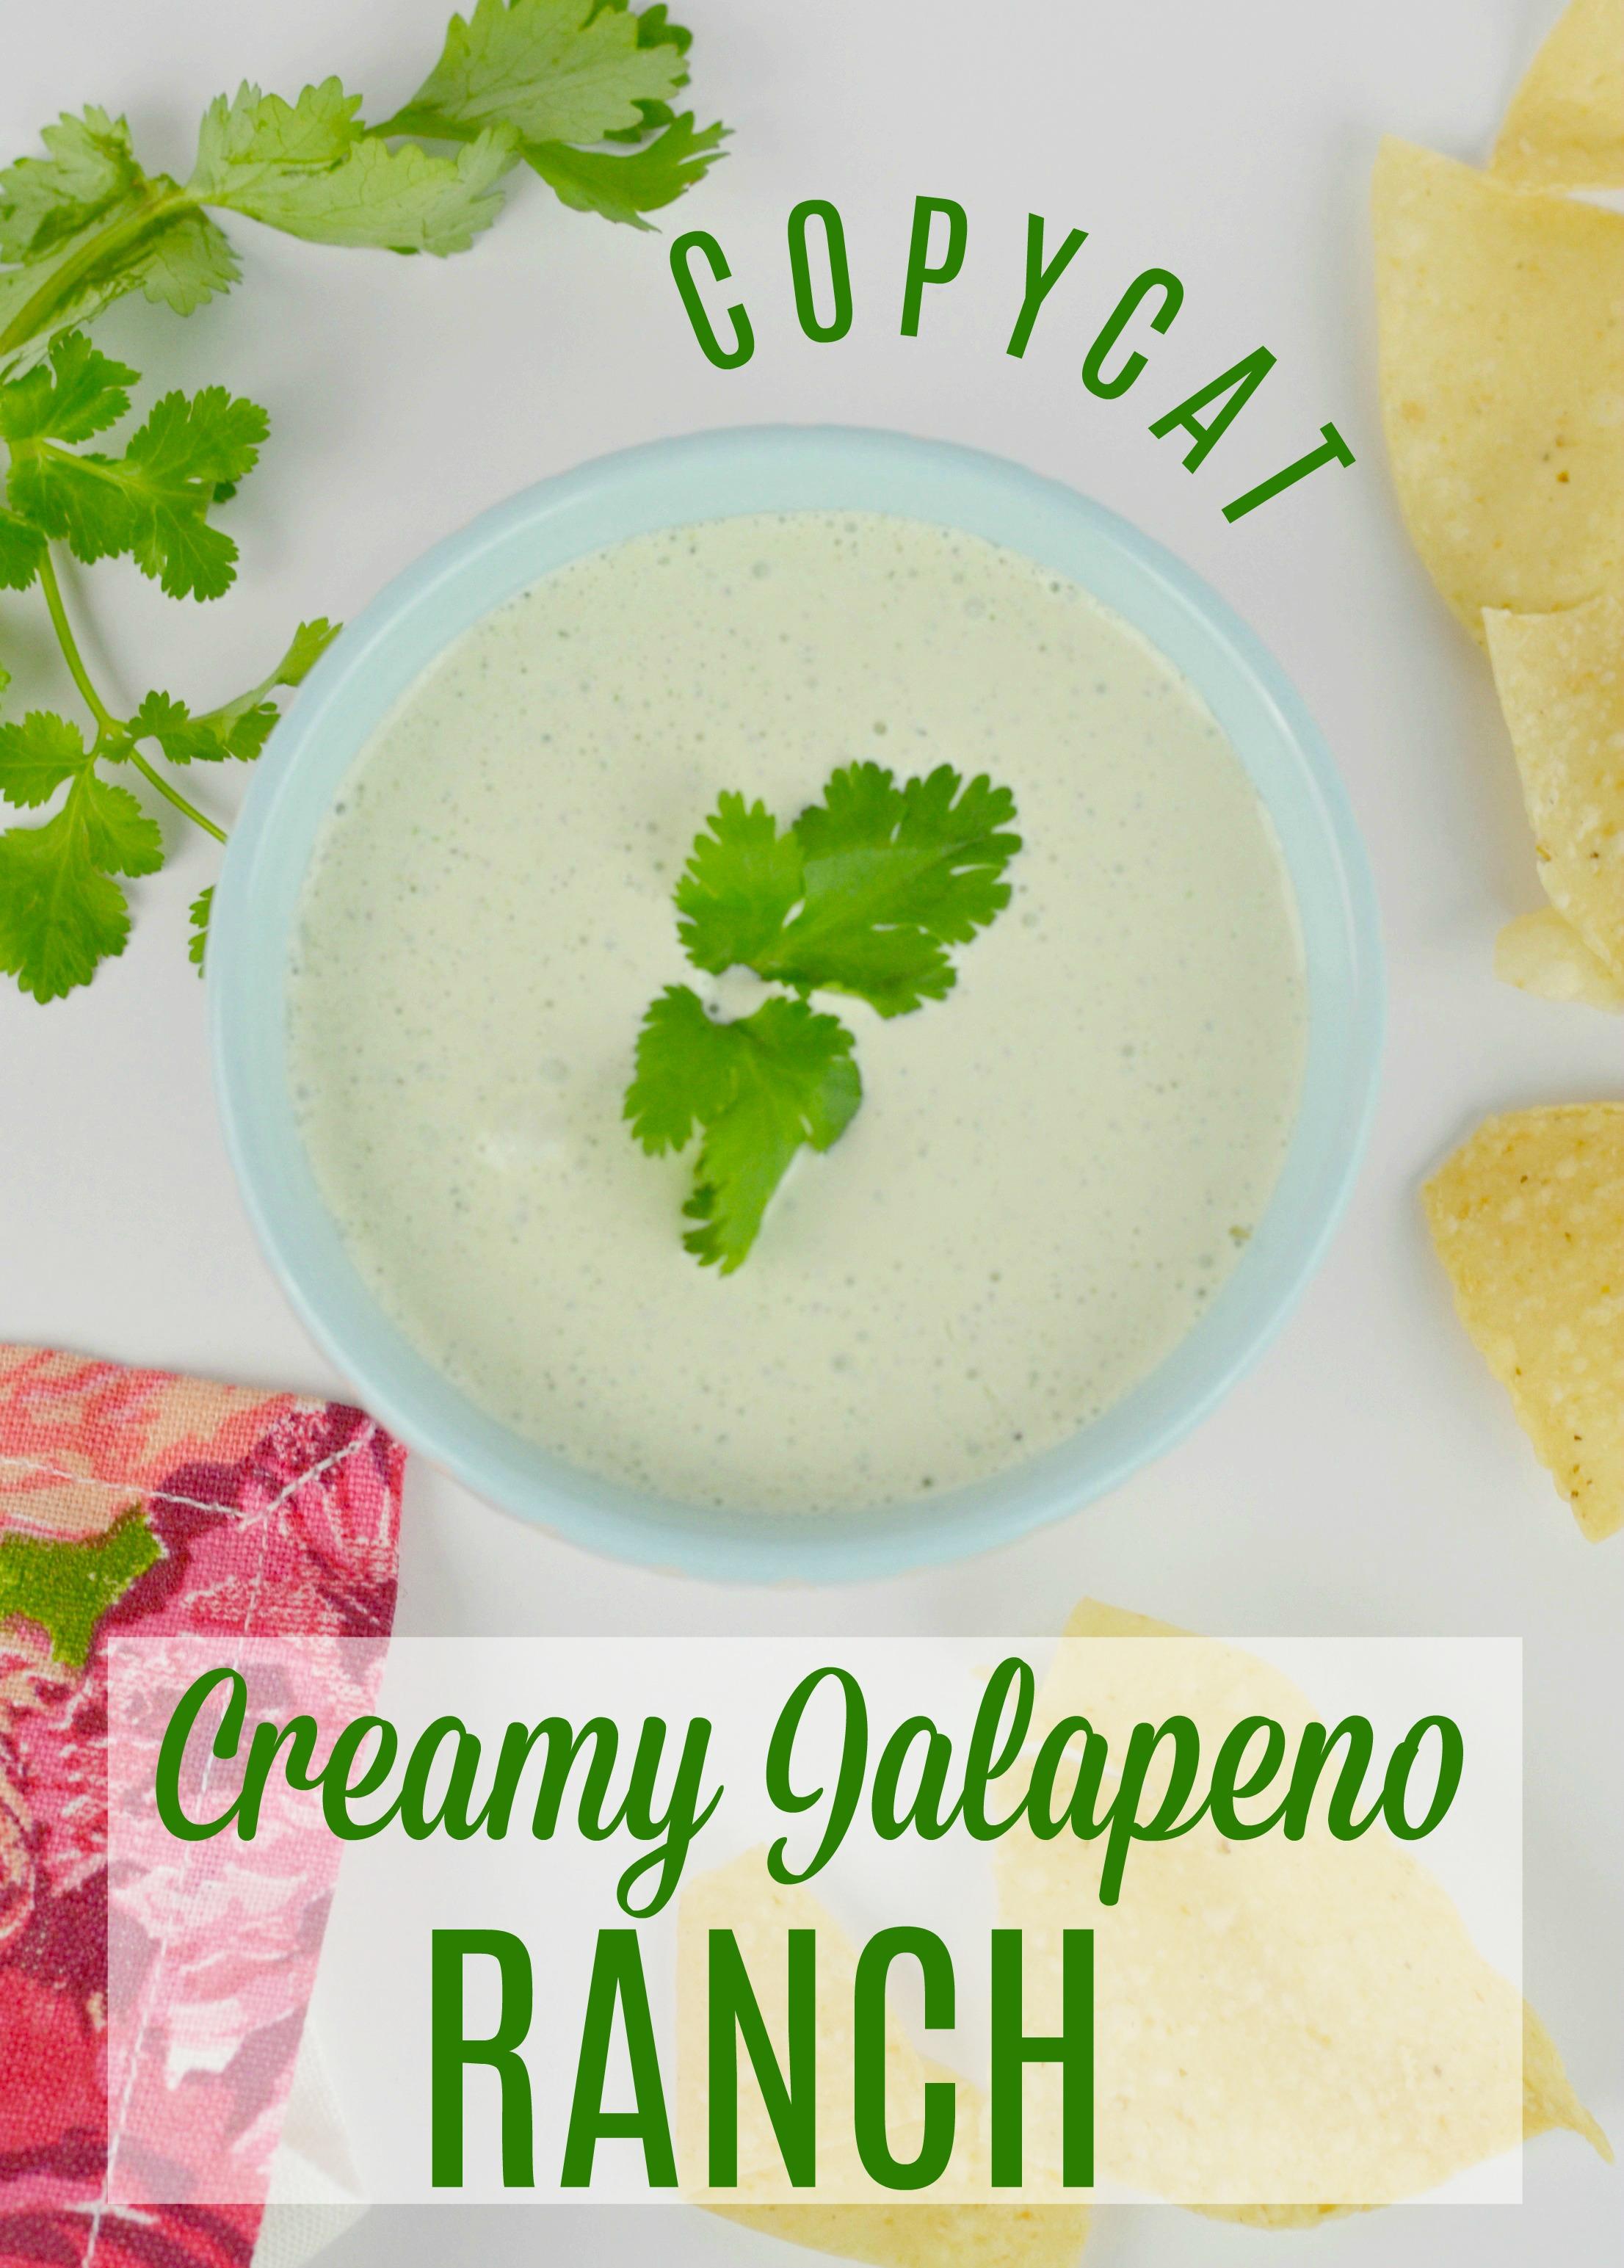 Chuys Copycat Creamy Jalapeno Ranch